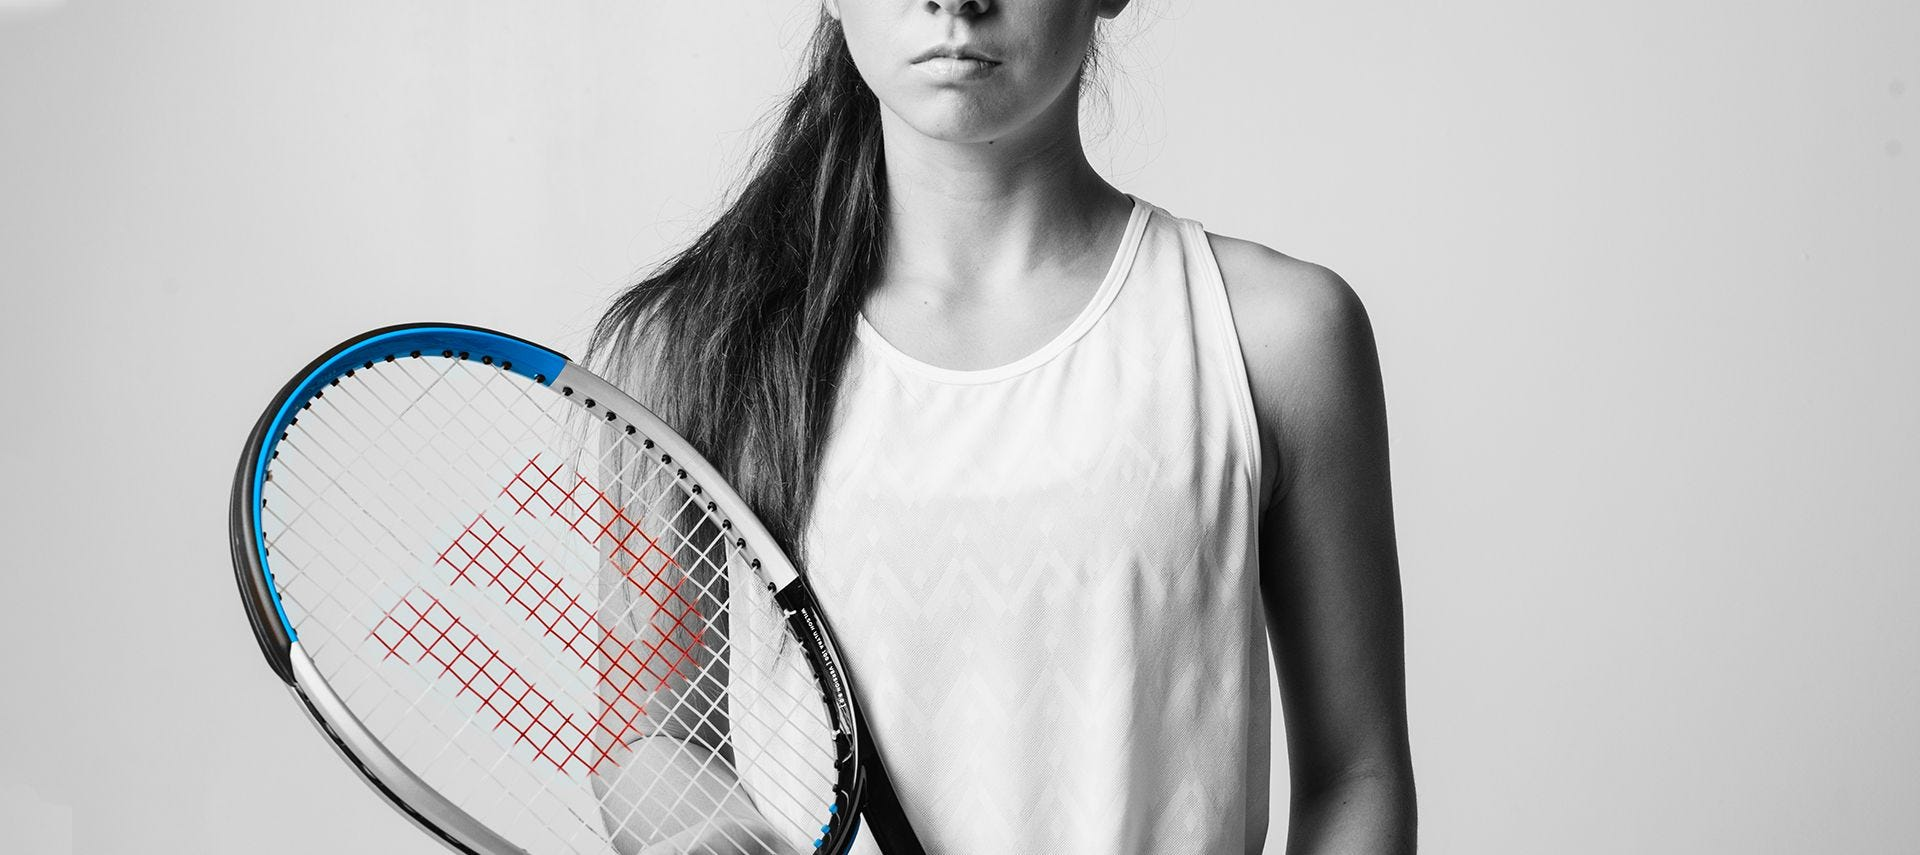 Tennis player holding Ultra v3 racquet